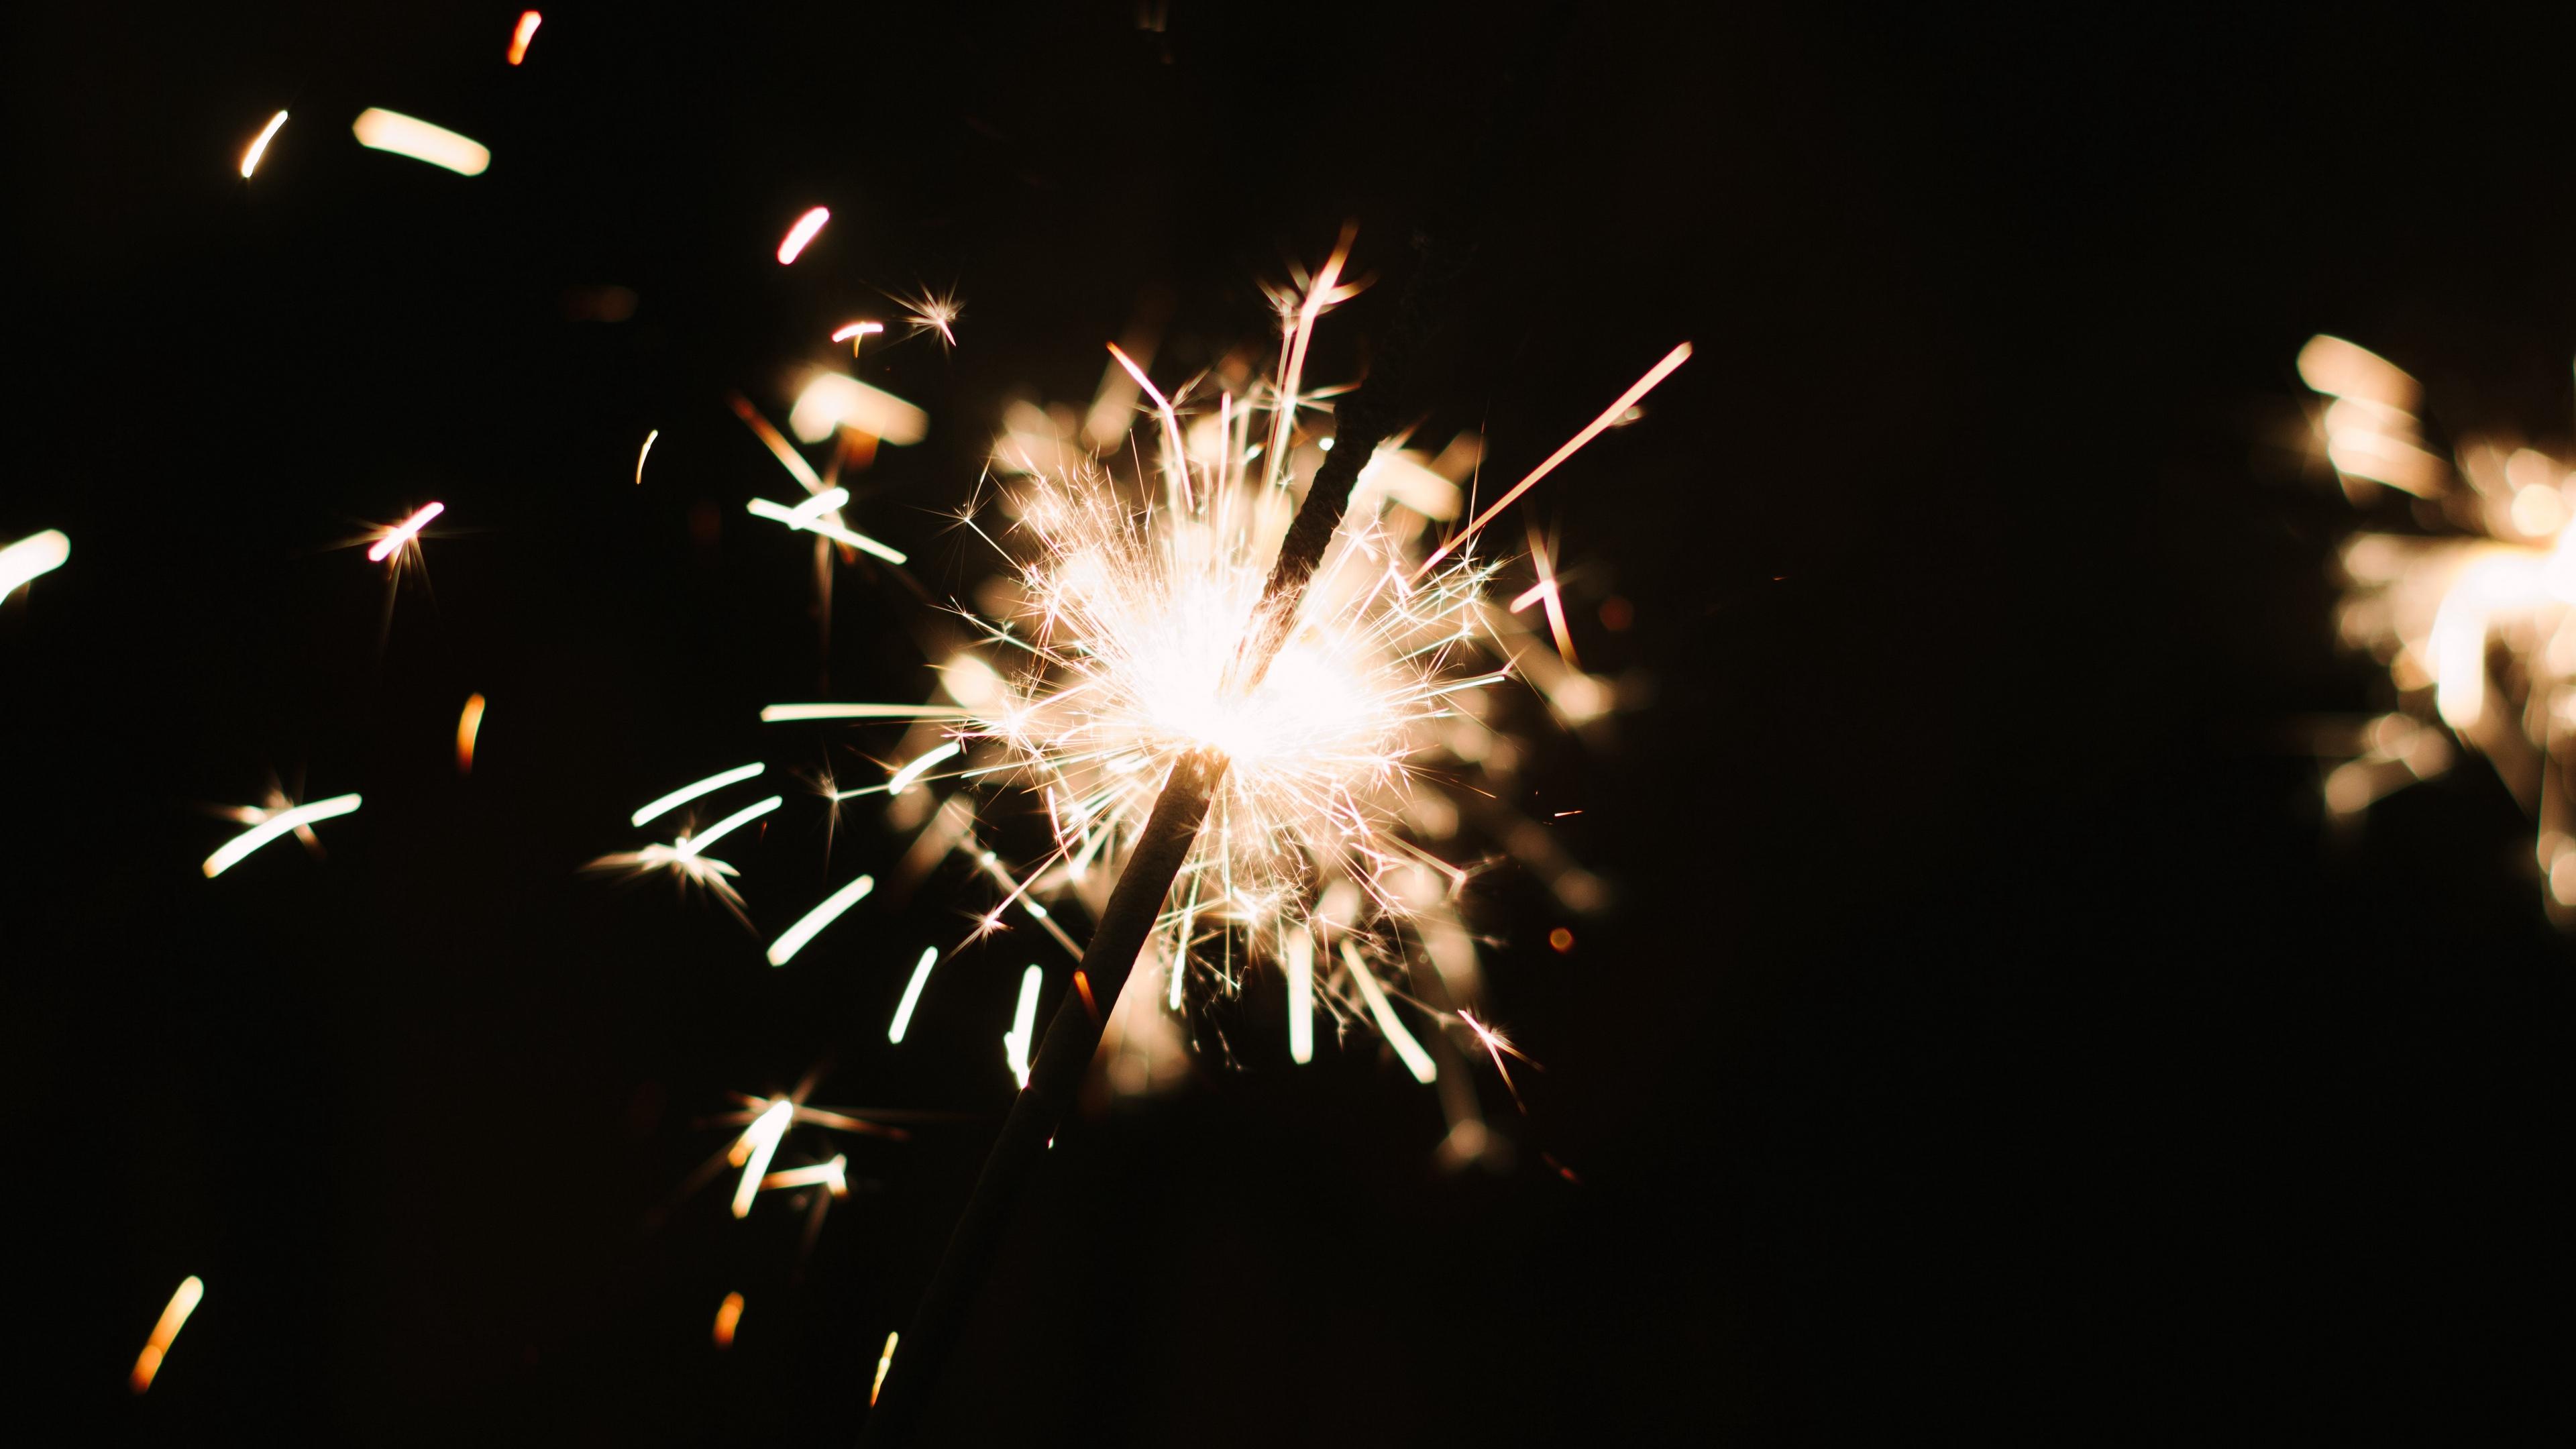 bengal fire sparks holiday dark background 4k 1538344747 - bengal fire, sparks, holiday, dark background 4k - Sparks, Holiday, bengal fire